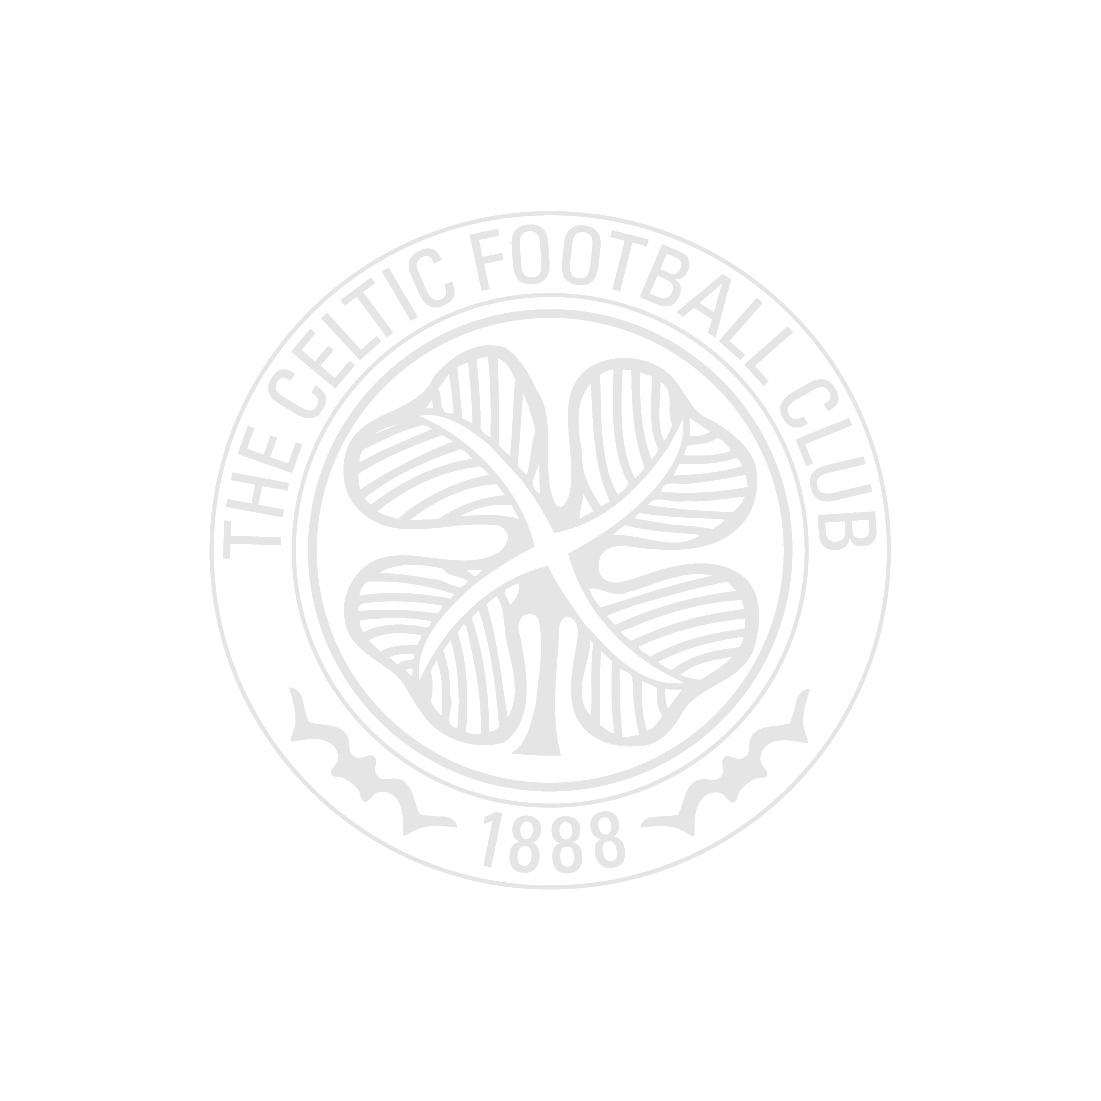 Scottish Football Requiem or Renaissance